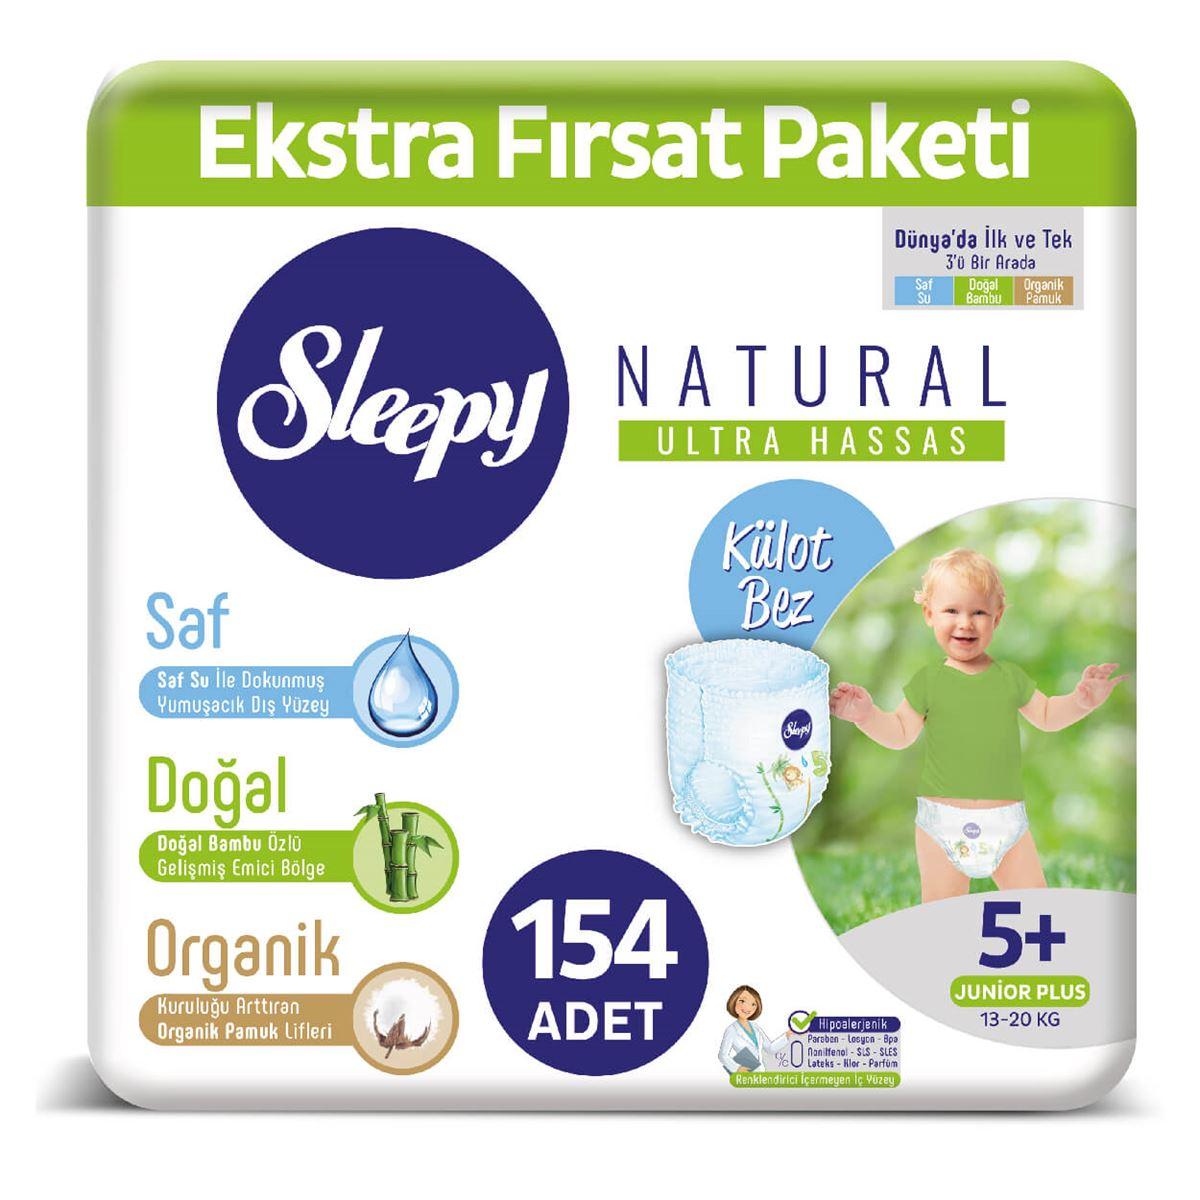 Sleepy Natural KÜLOT Bez 5+ Numara Junior Plus Ekstra Fırsat Paketi 154 Adet